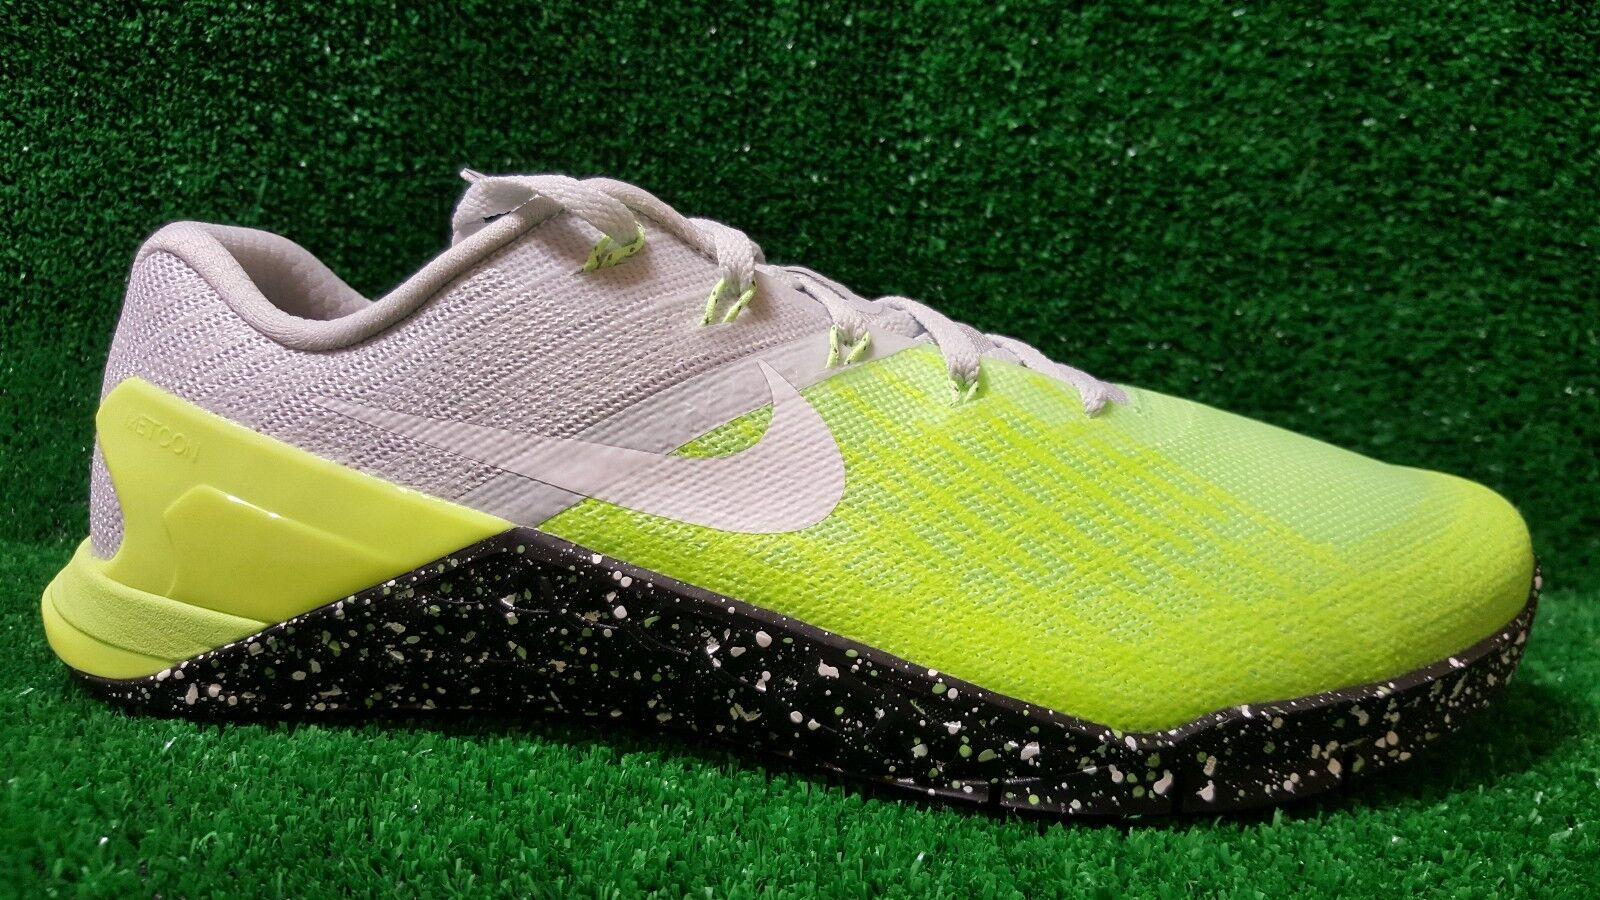 Nike Men's Metcon 3 Crossfit Training 852928 006 Sz-8.5-12 / 852928 600 Sz-11